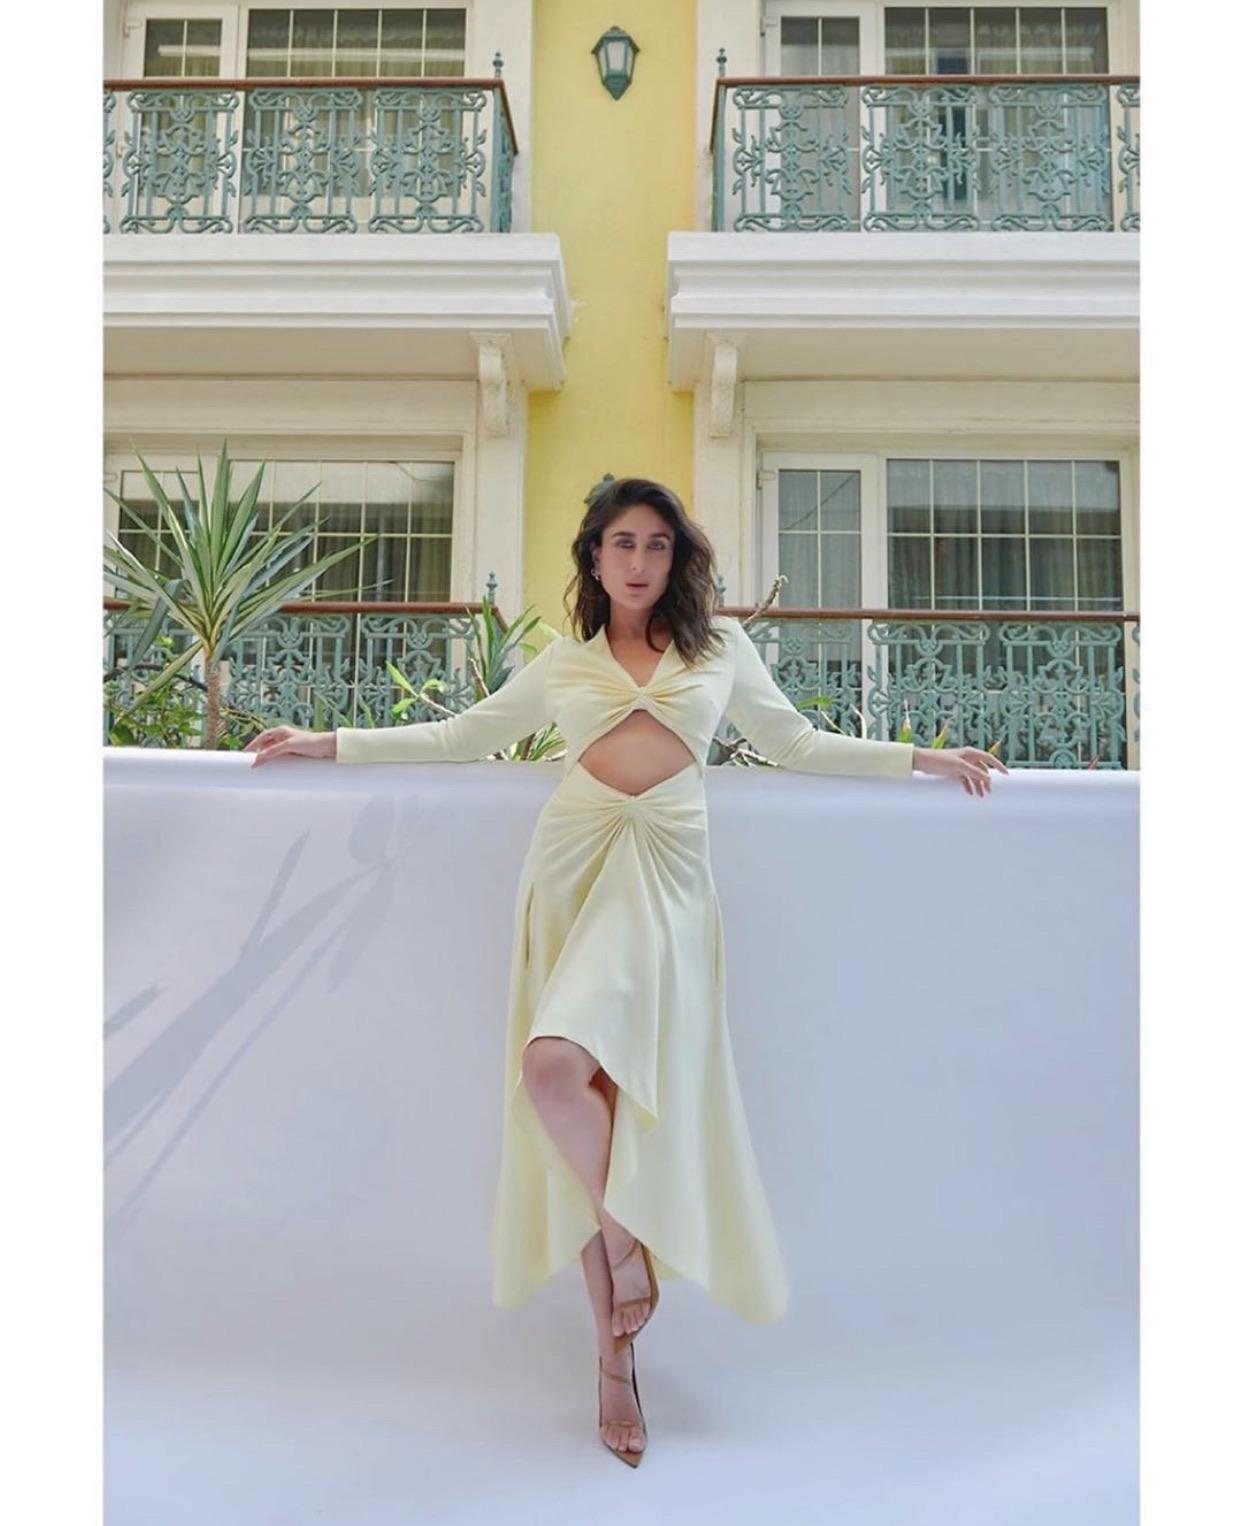 Fashion Face-off: Priyanka Chopra, Kareena Kapoor Don Similar Style in Latest Outfits